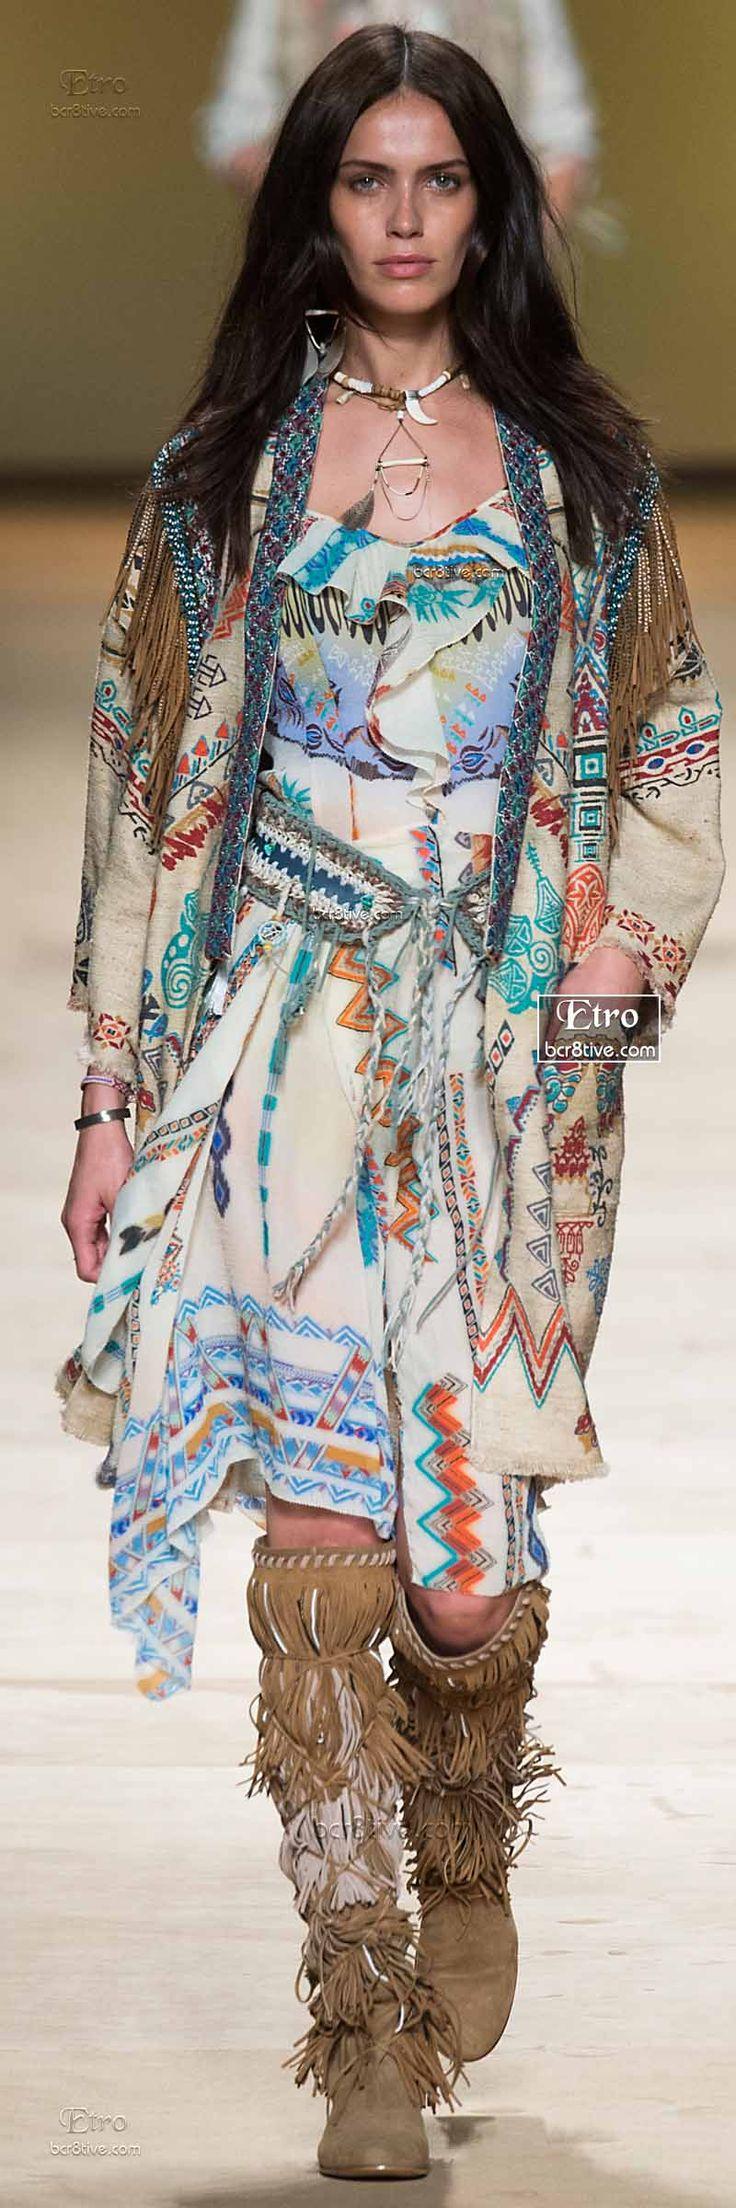 Native American Fashion Clothing